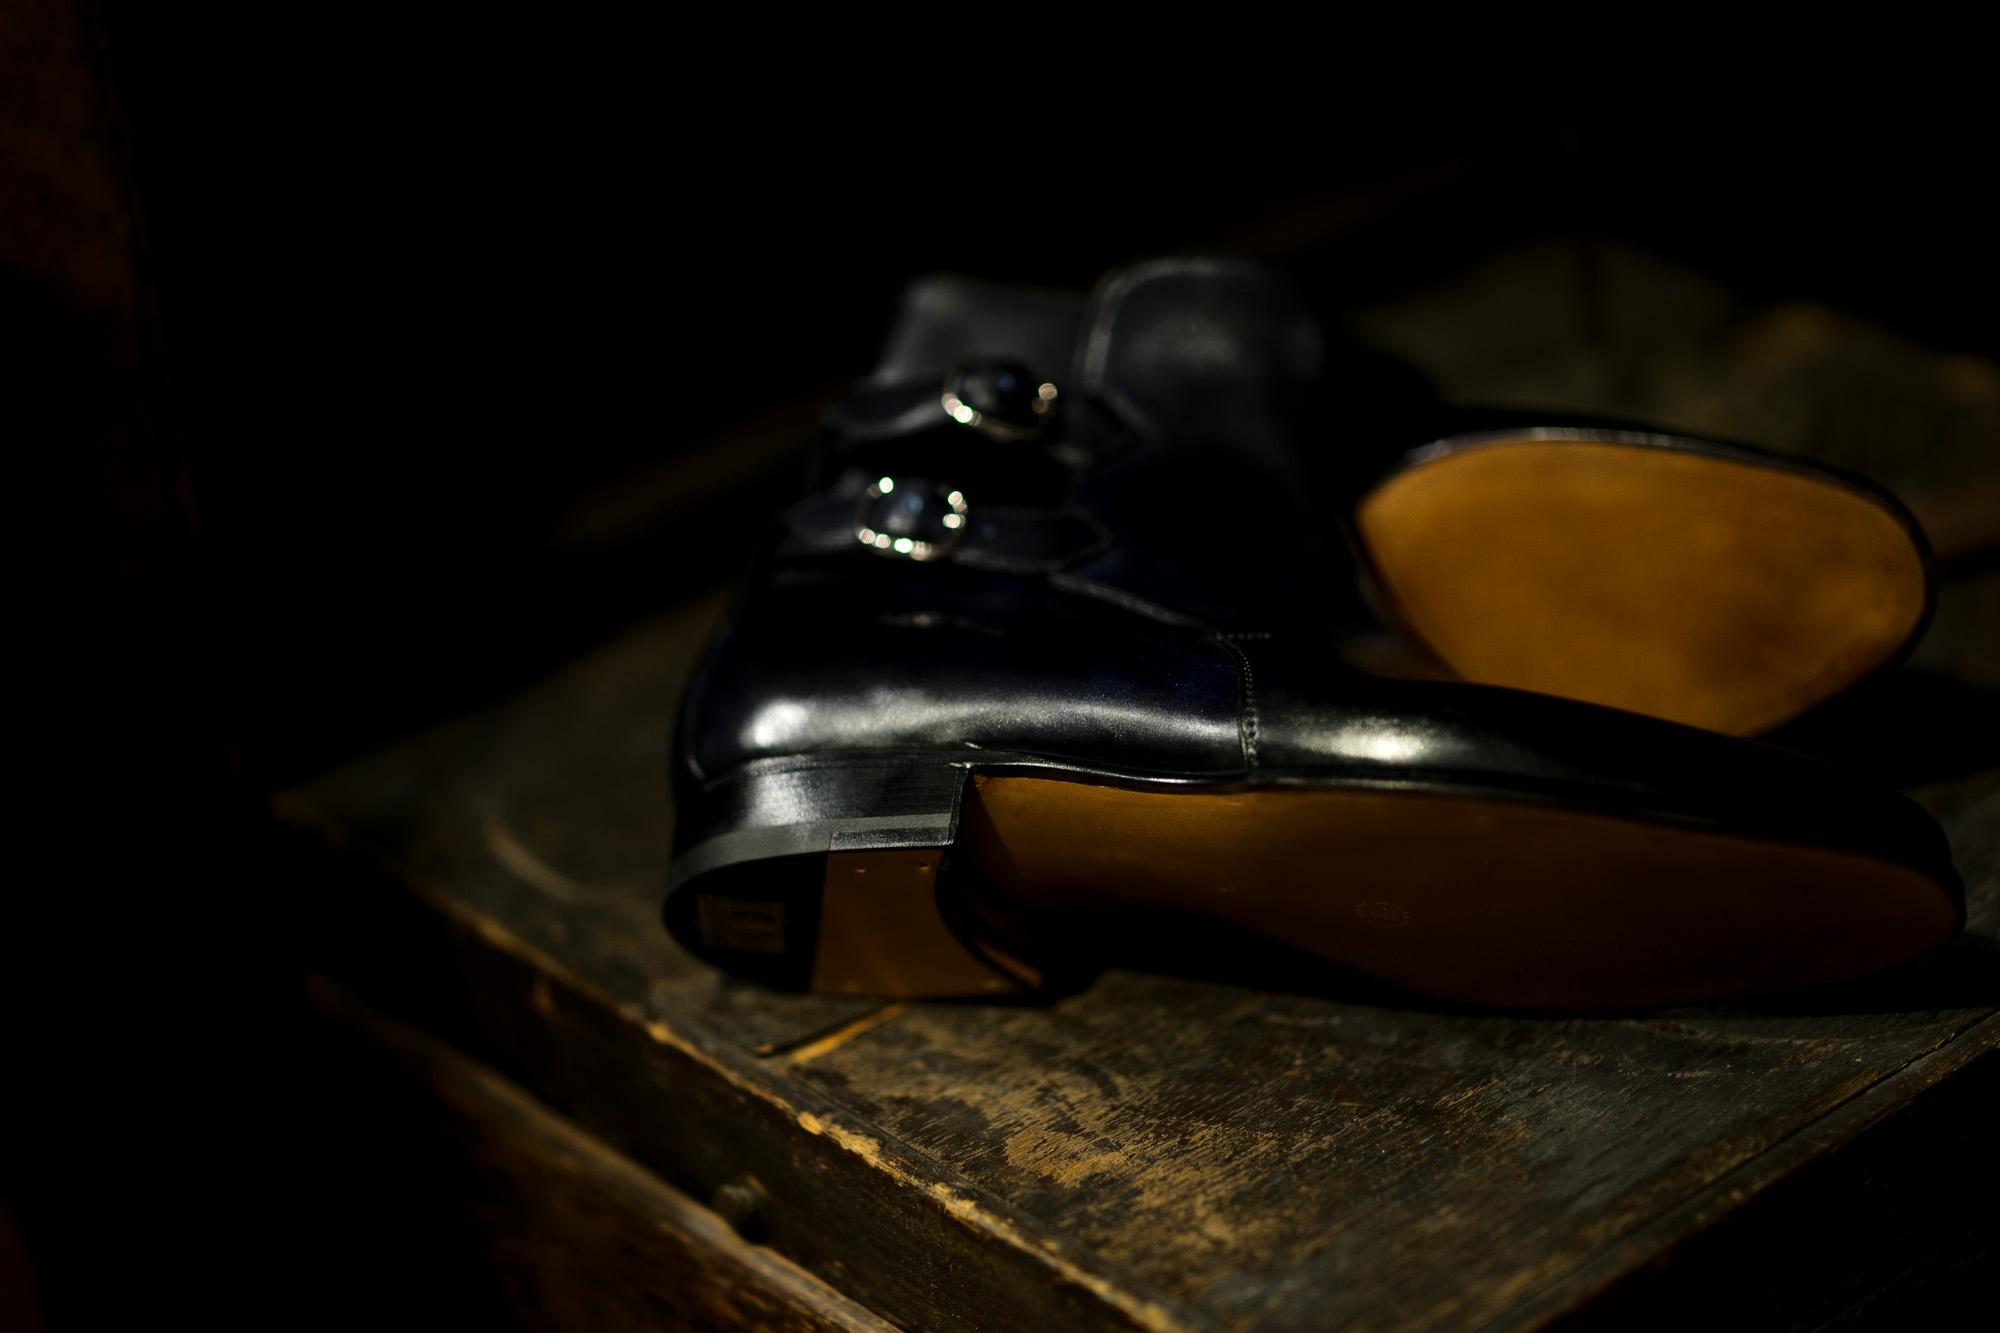 ENZO BONAFE(エンツォボナフェ) ART.3995 Double strap boot MUSEUM CALF ミュージアムカーフ ダブルストラップブーツ DEEP BLUE (ディープブルー) made in italy (イタリア製) 2021 愛知 名古屋 Alto e Diritto altoediritto アルトエデリット